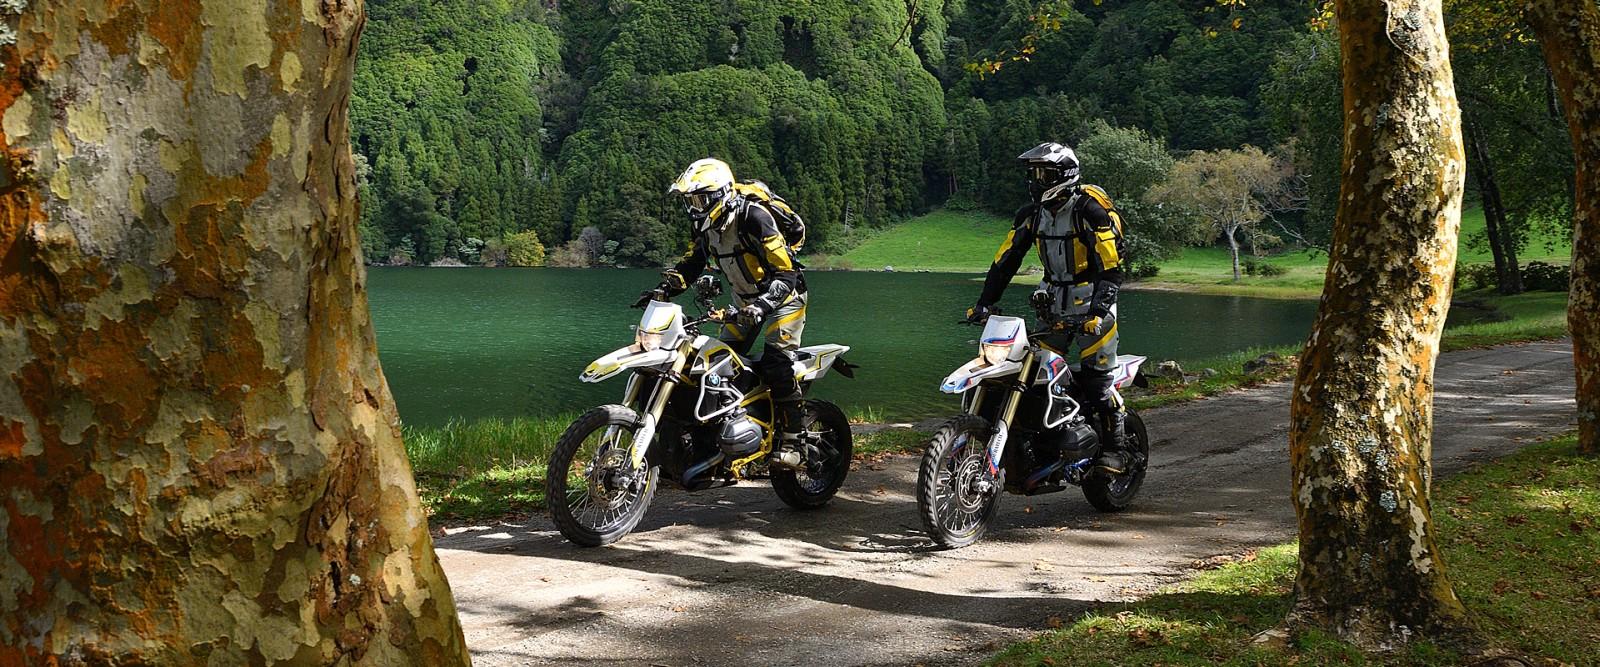 BMW-Motorrad-Touratech-R1200-GS-Rambler-11